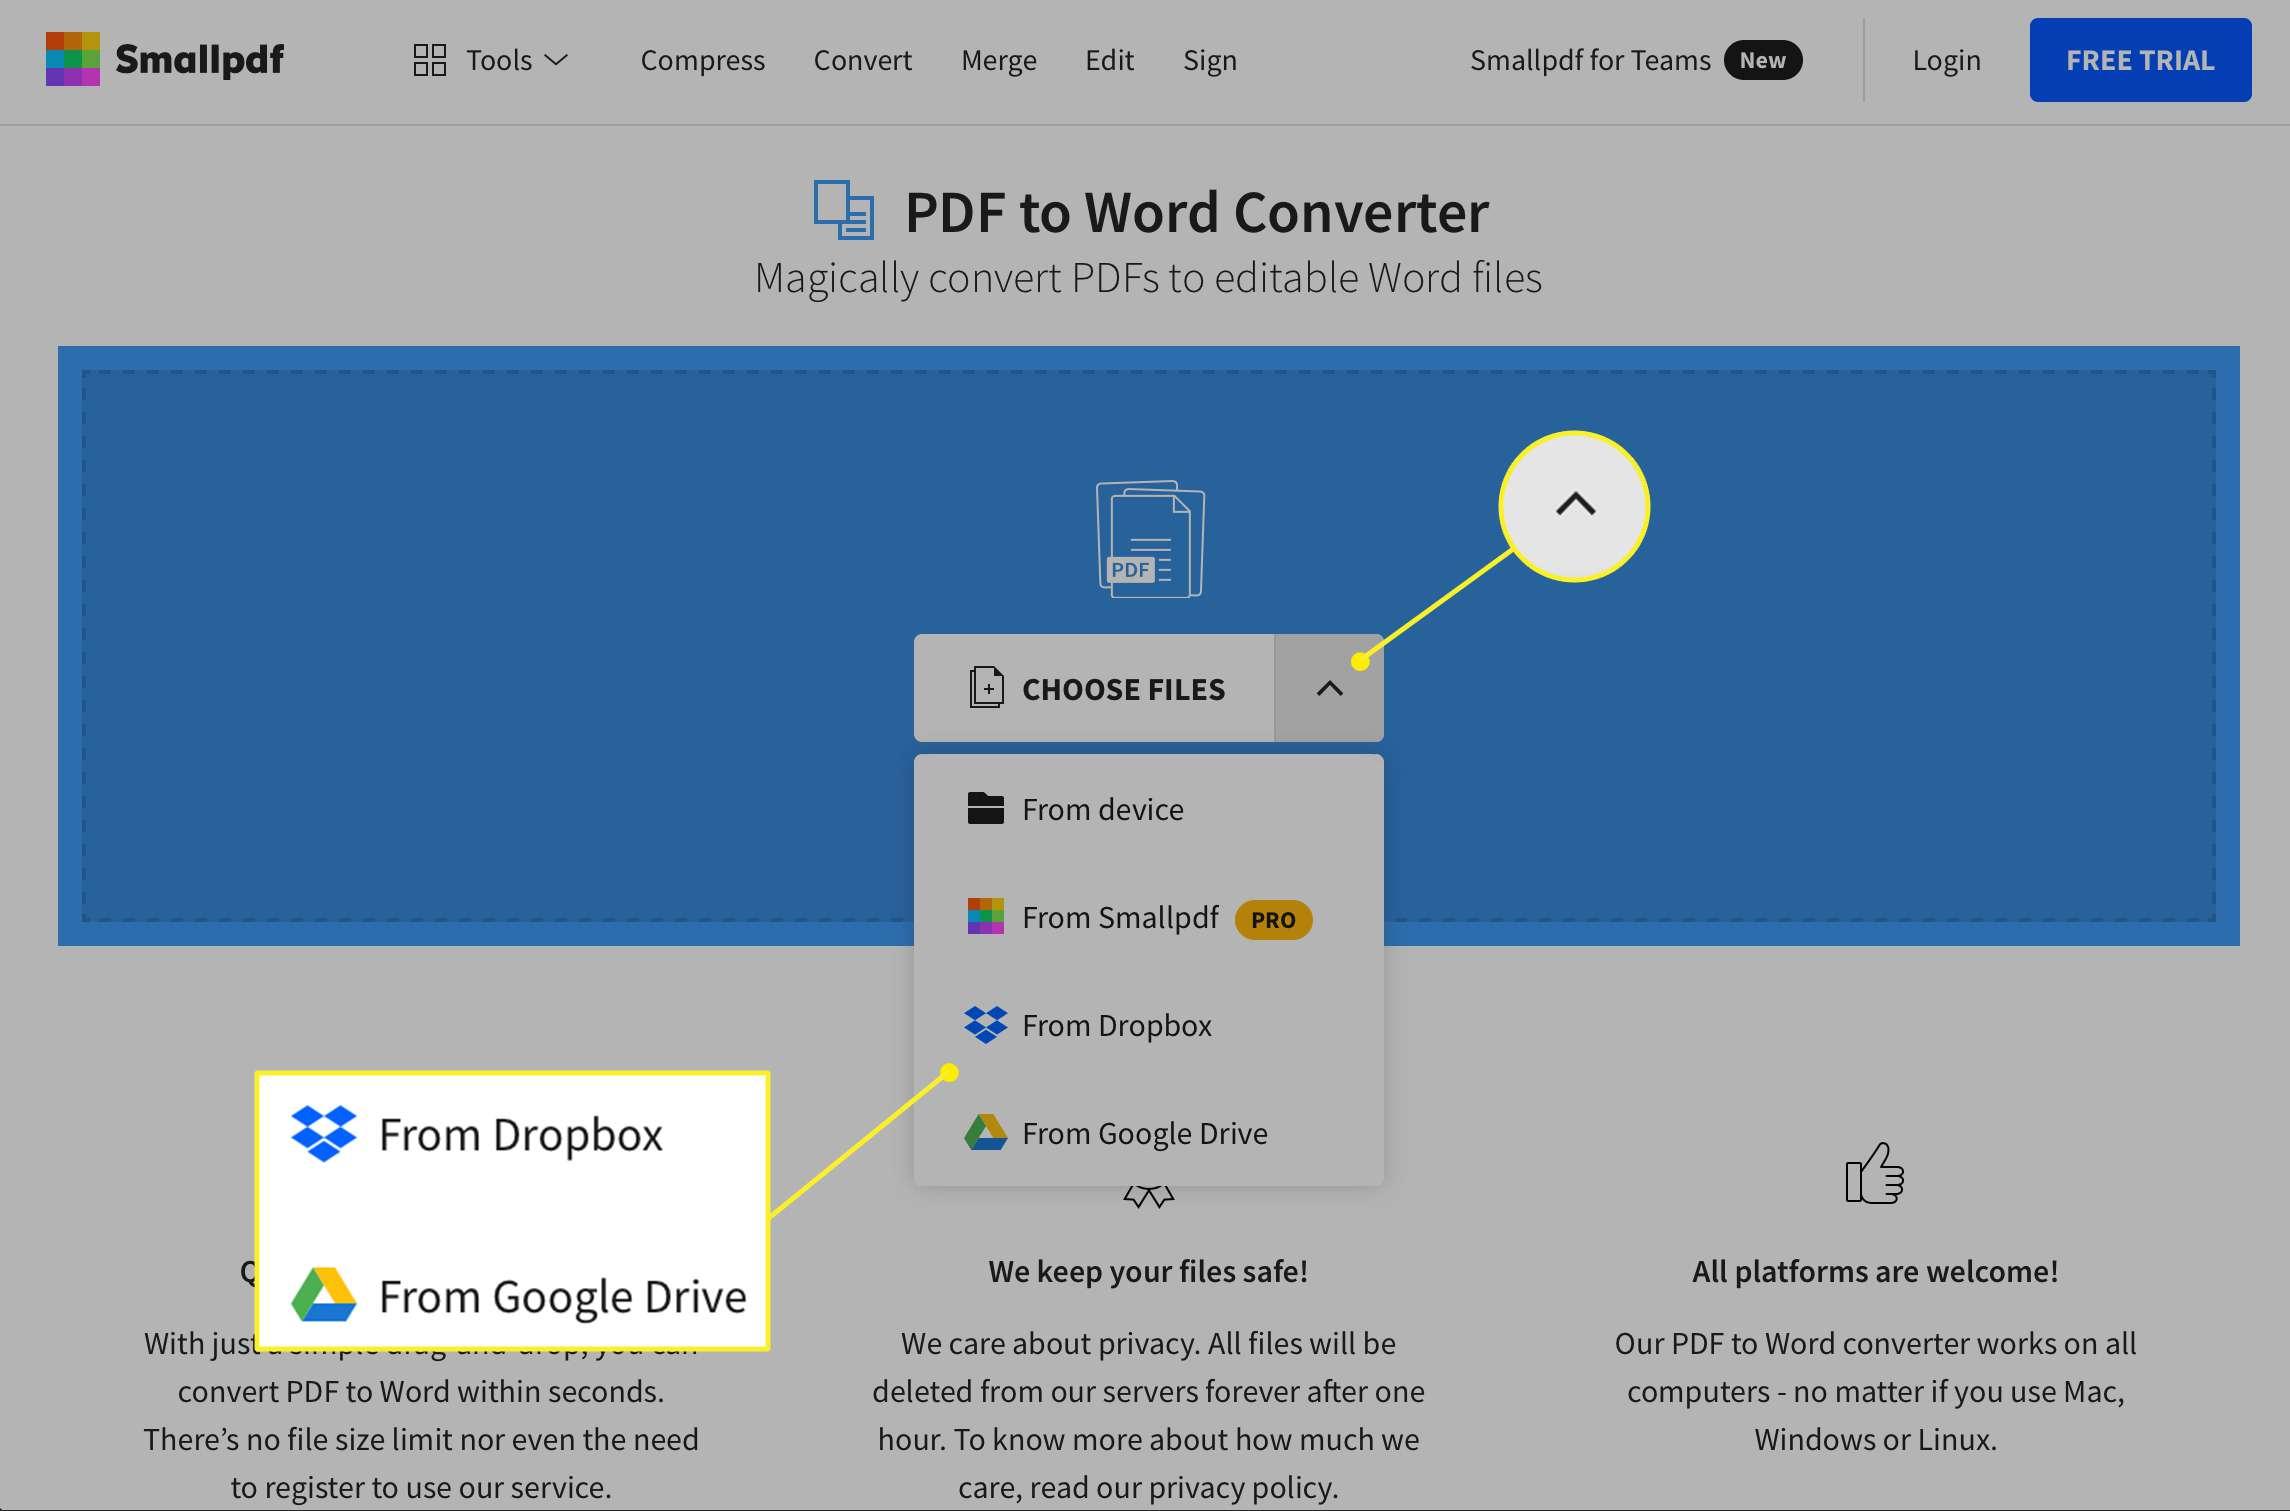 PDF upload options at Smallpdf website